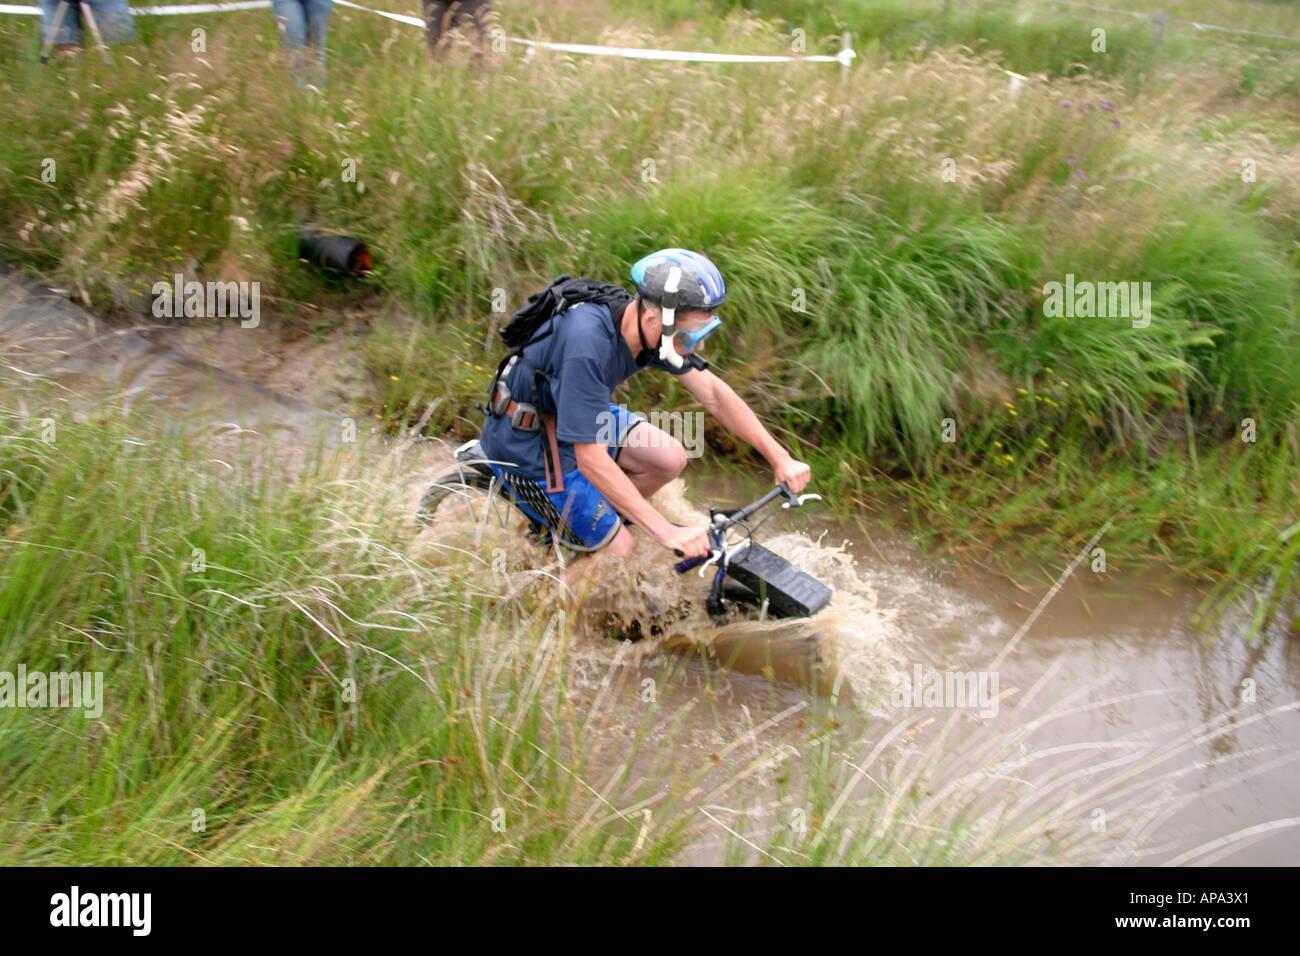 Competitor In World Mountain Bike Bog Snorkeling Championships